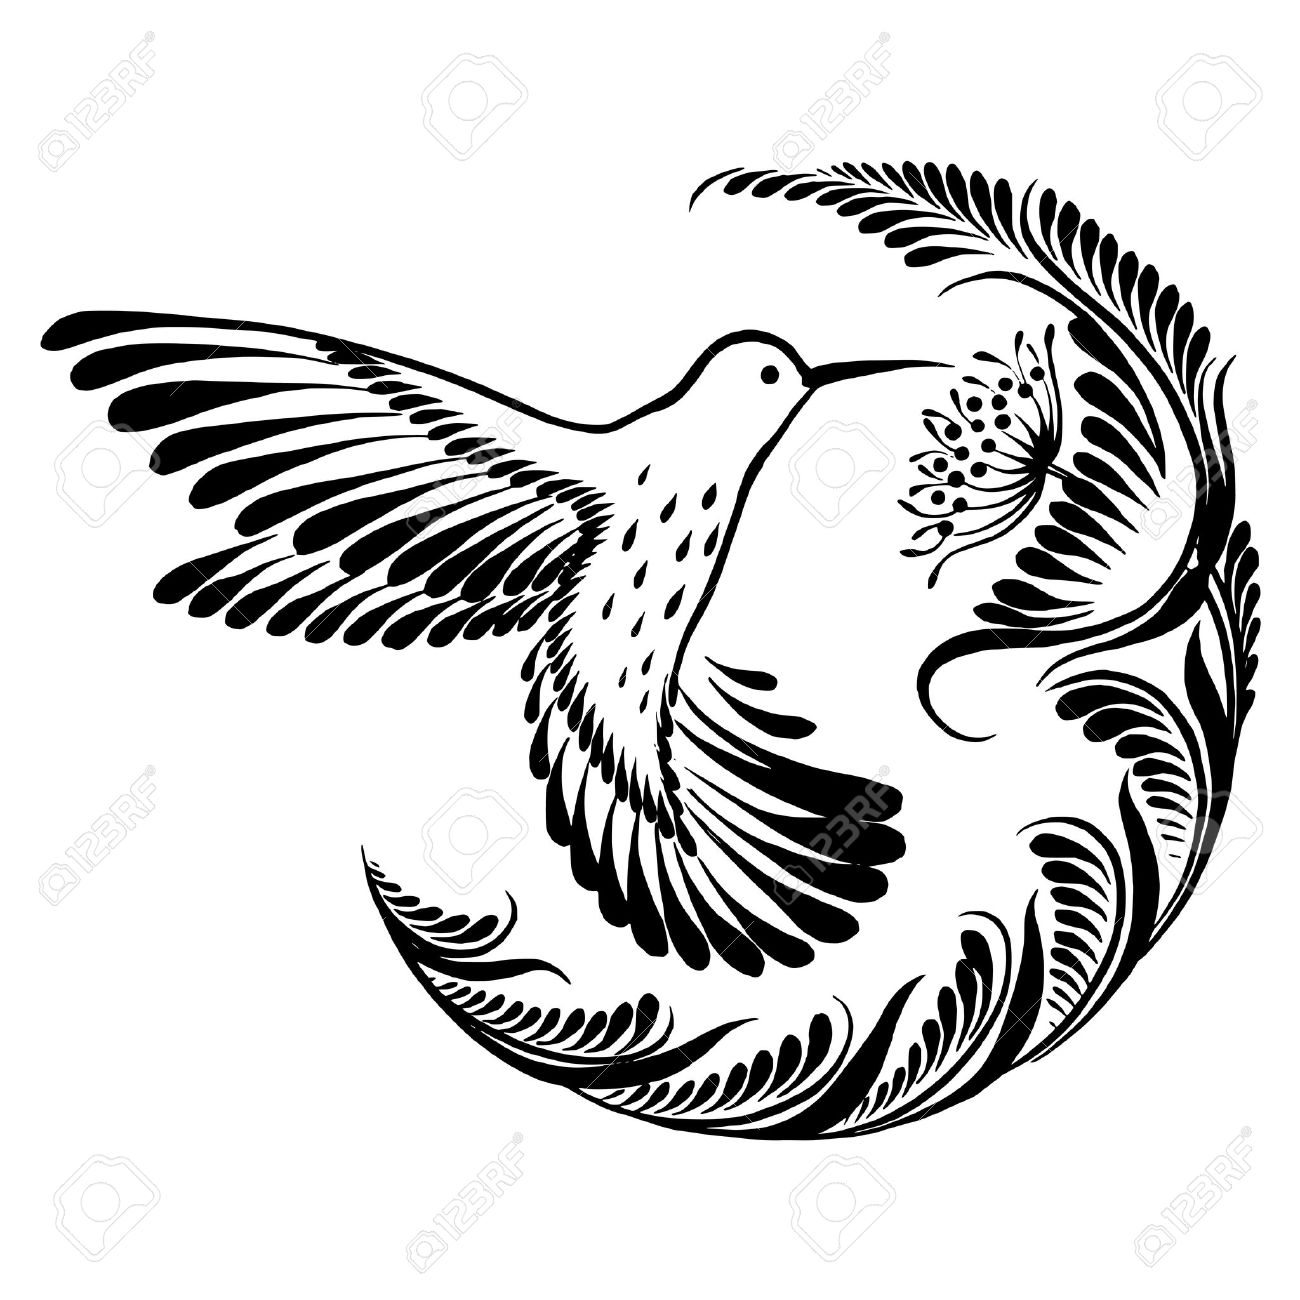 4 324 hummingbird stock illustrations cliparts and royalty free